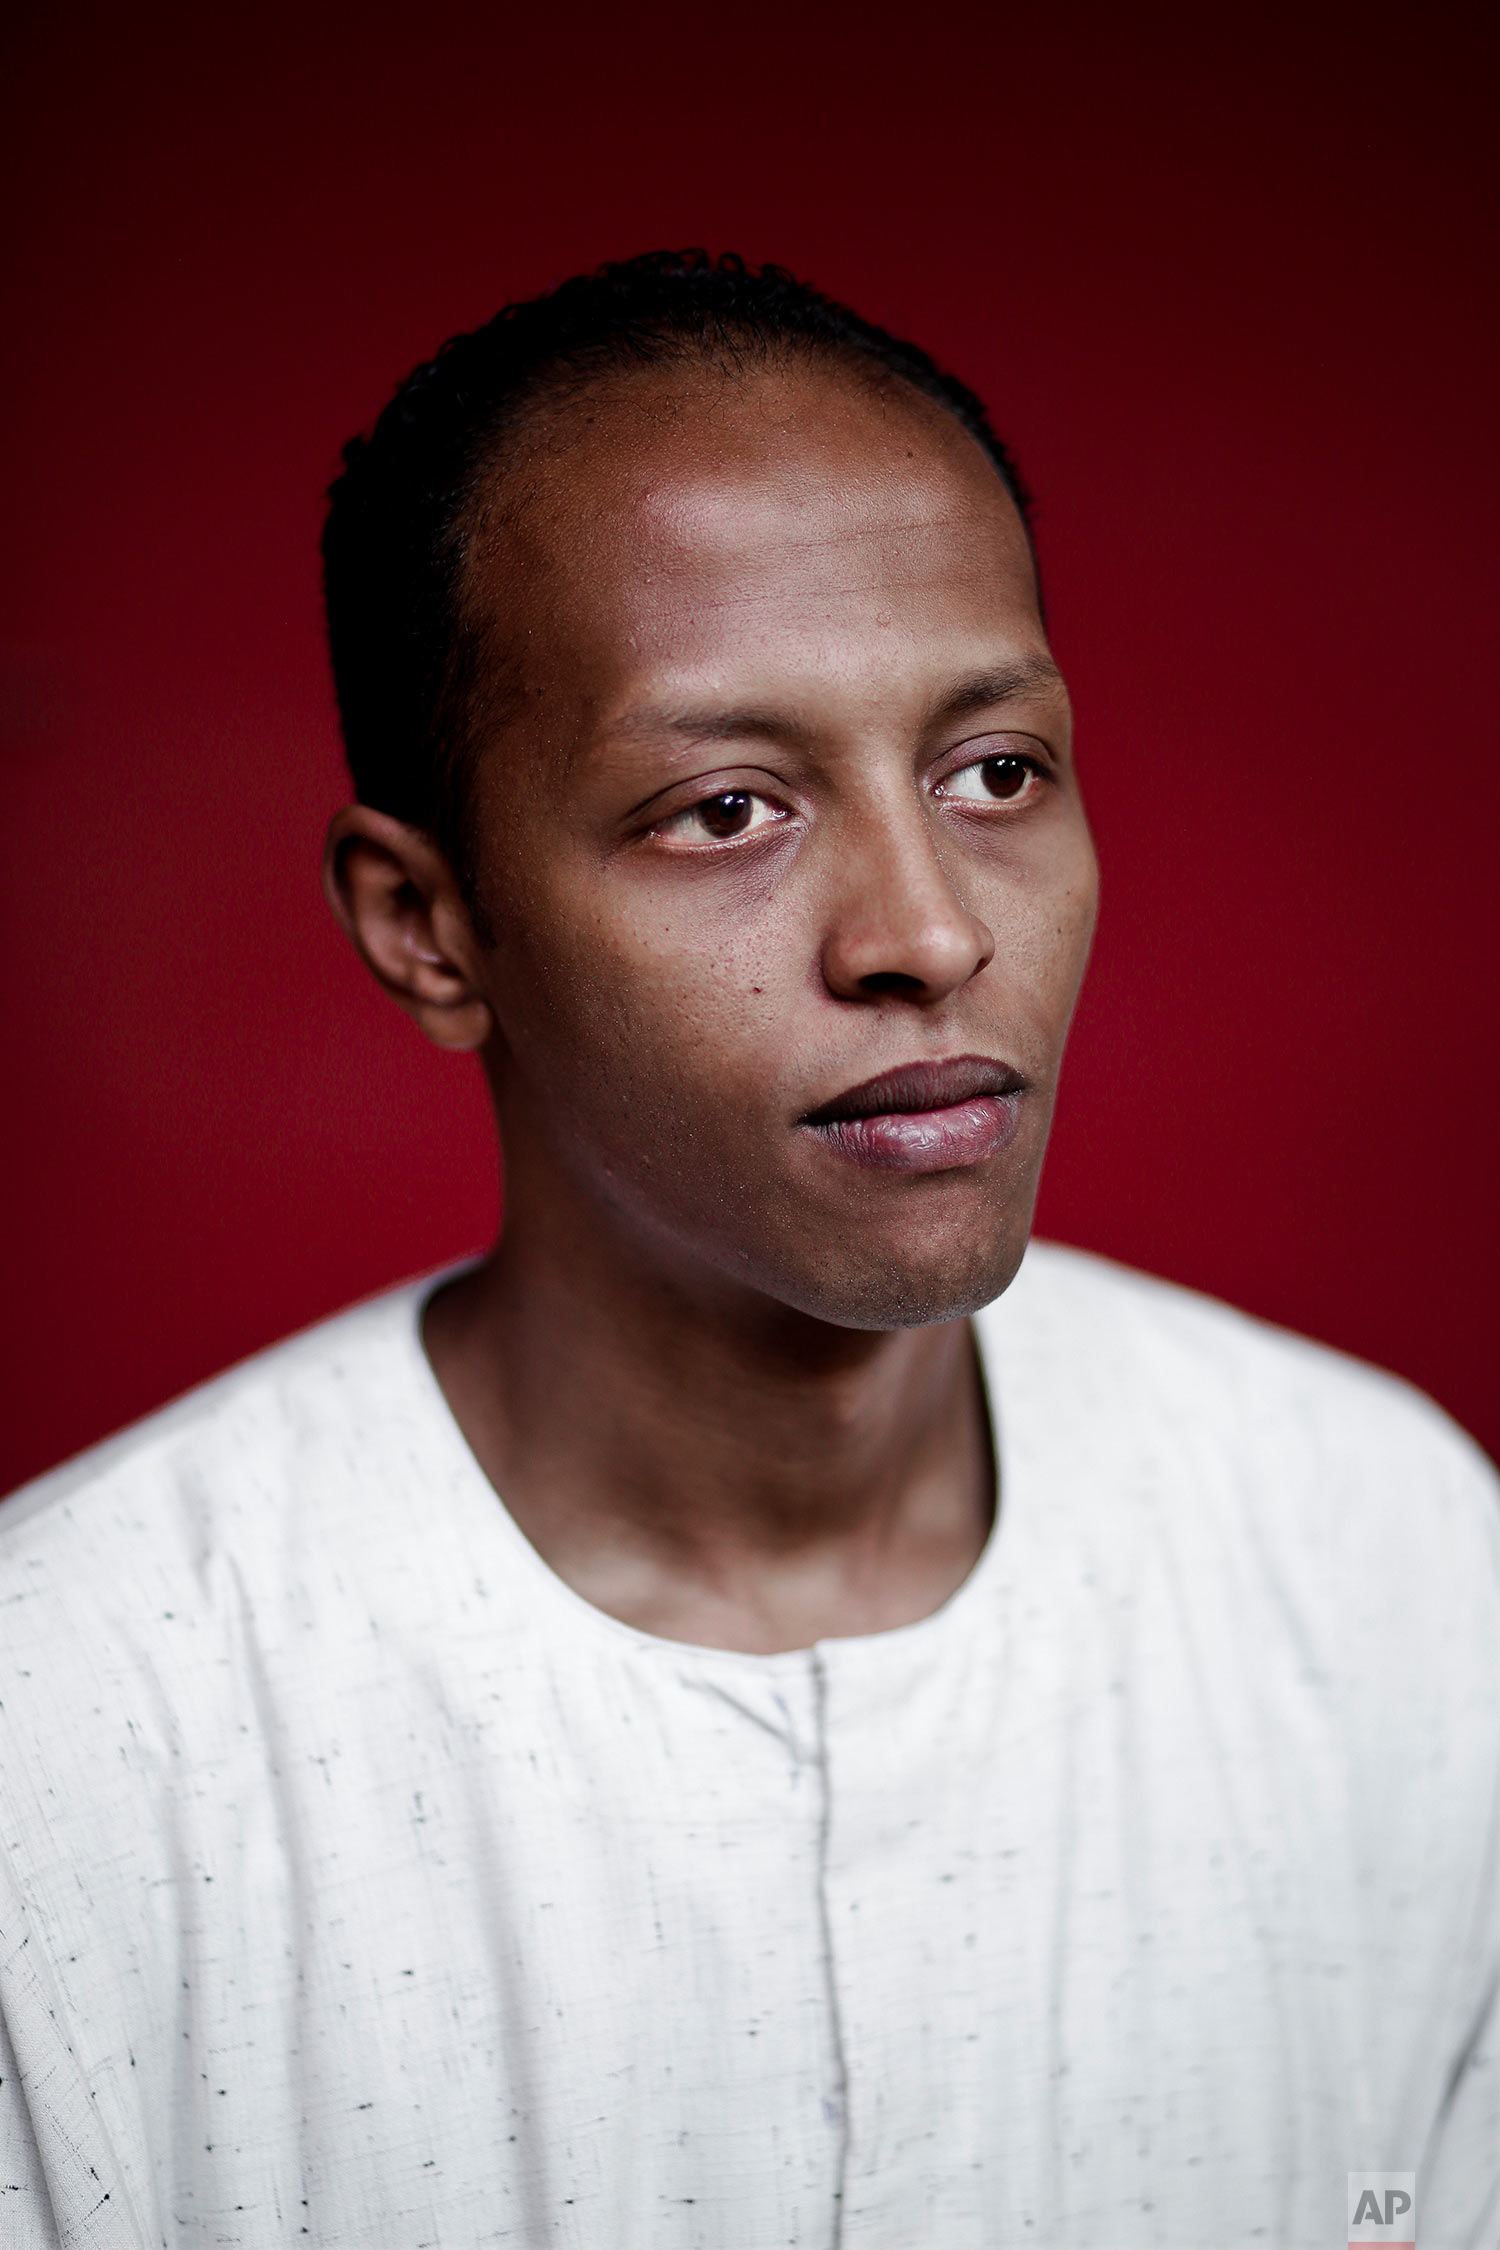 Nubian activist Waleed Toka poses for a photograph in Cairo, Egypt. (AP Photo/Nariman El-Mofty)